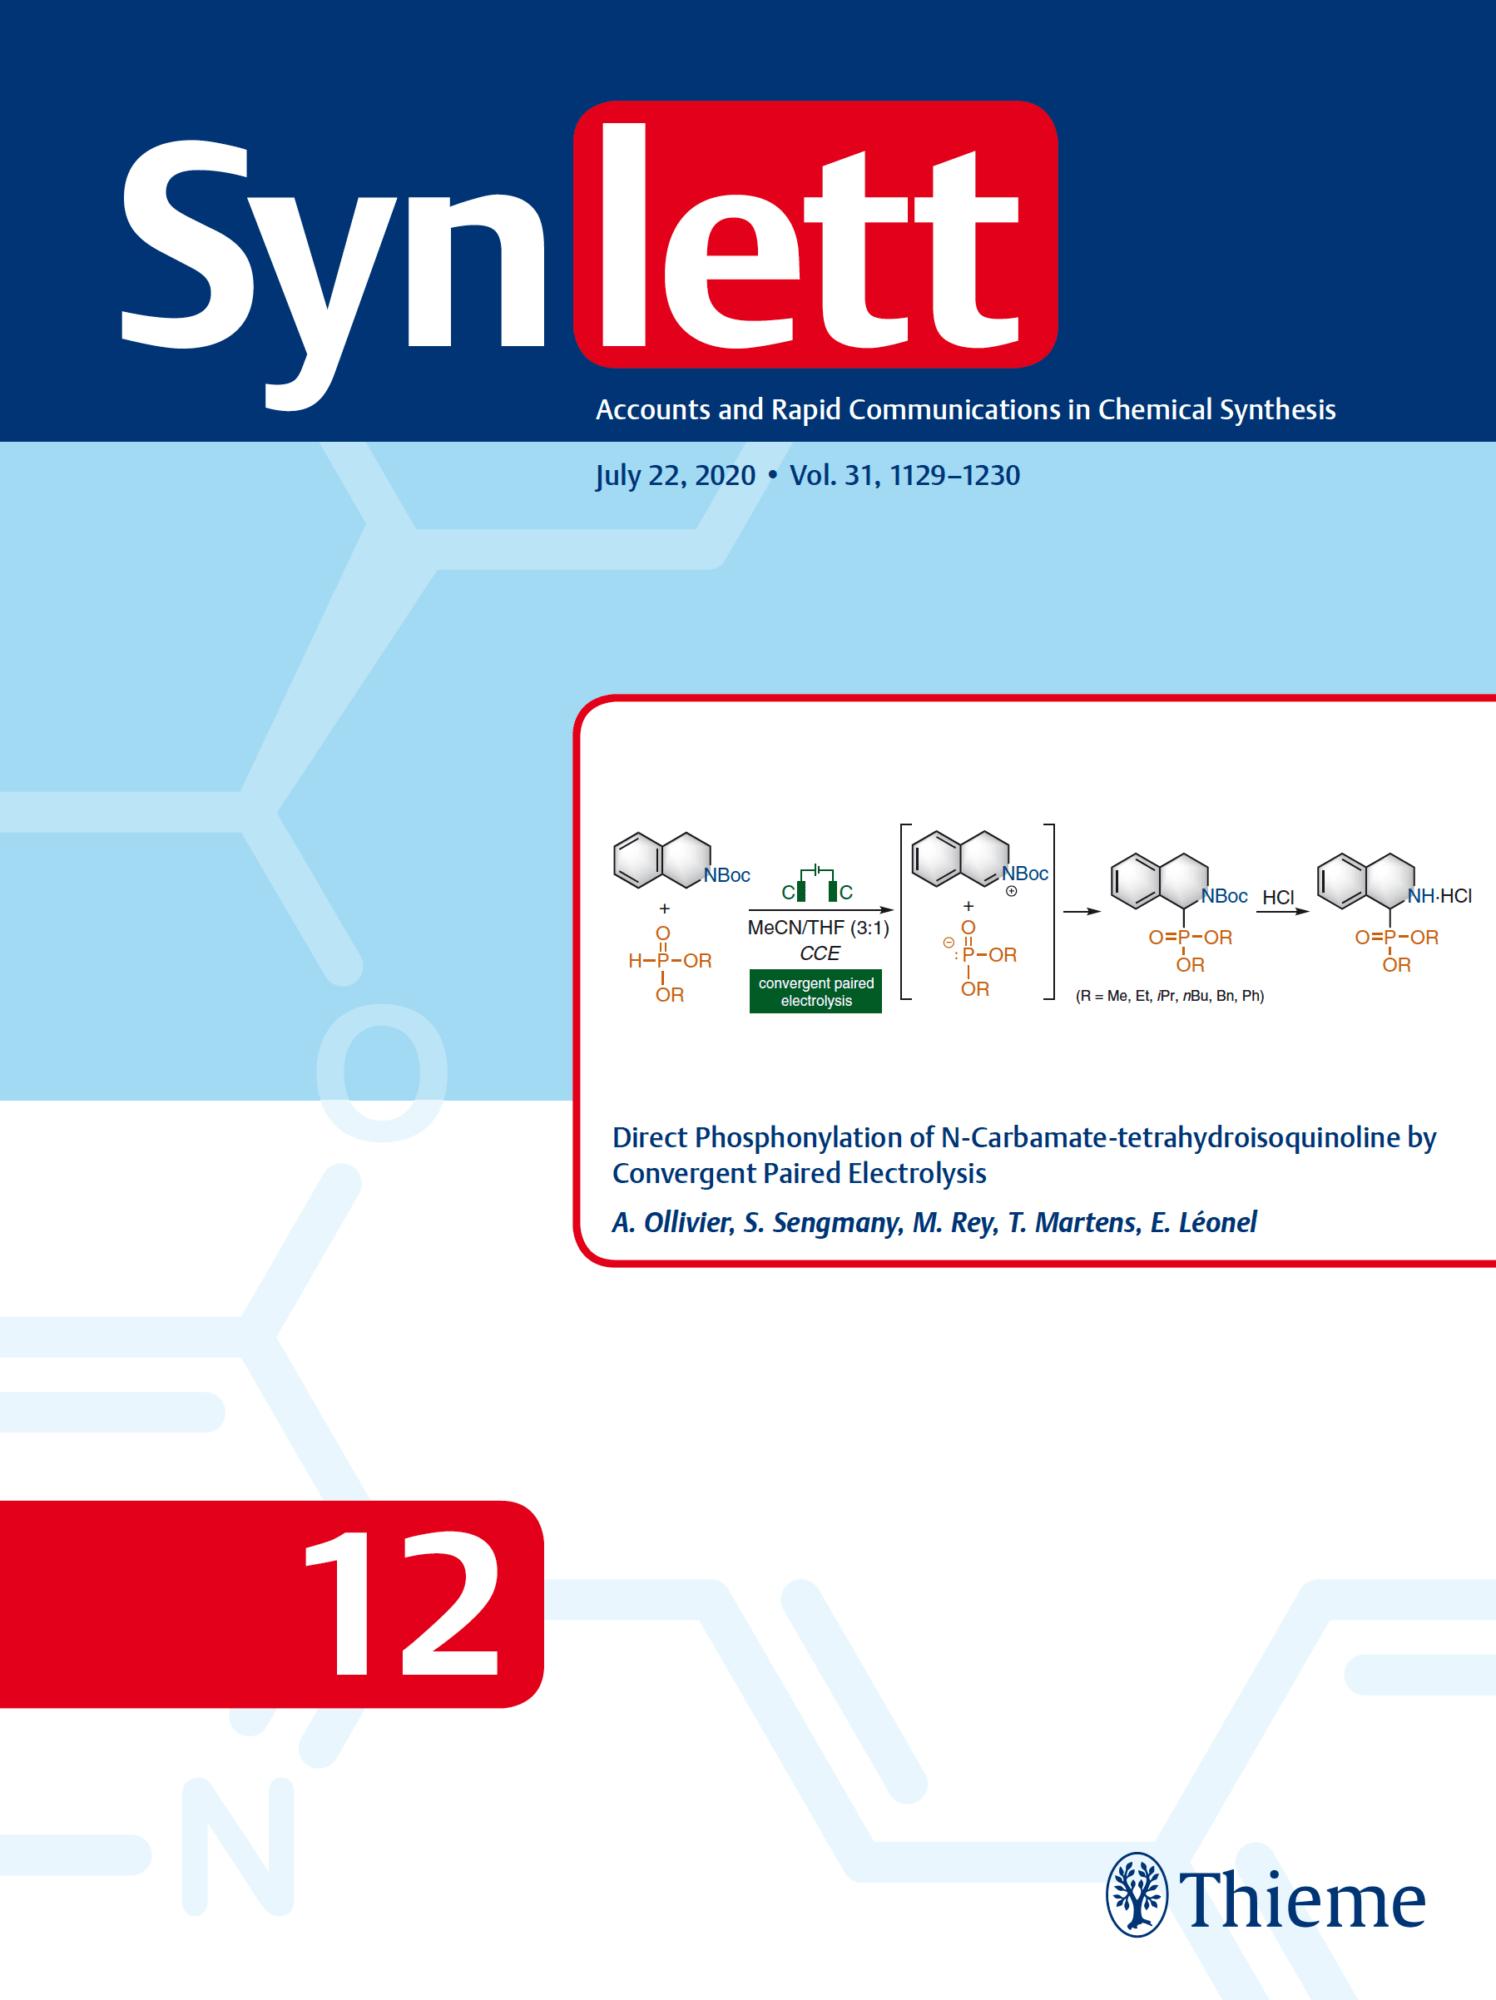 Couverture du volume 31 du journal Synlett (2020)